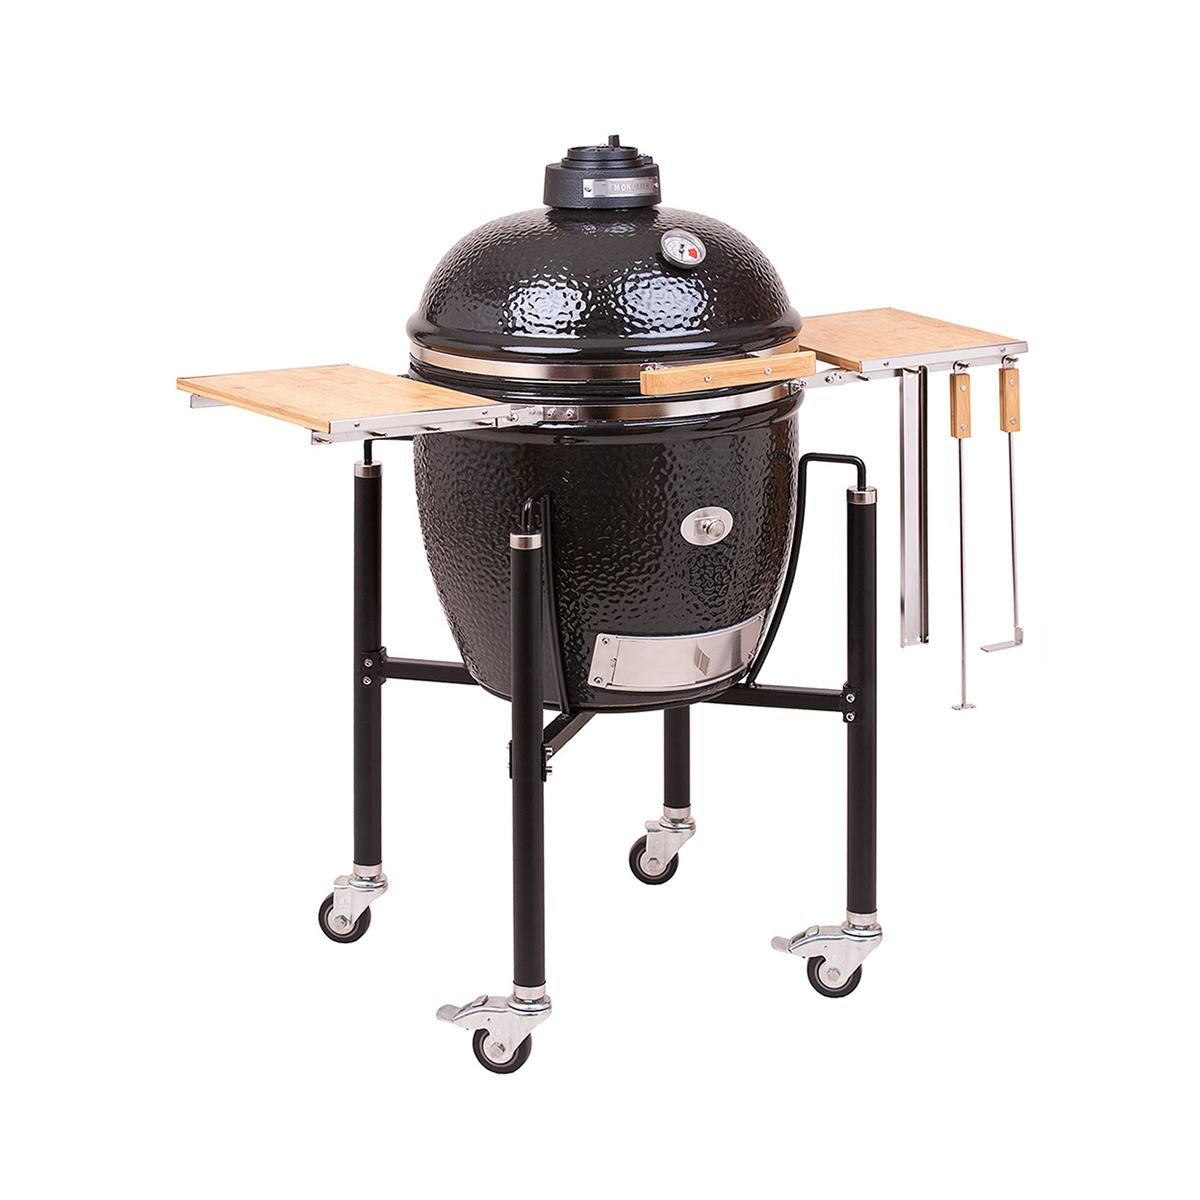 monolith classic ceramic grill including steel cart side shelves. Black Bedroom Furniture Sets. Home Design Ideas